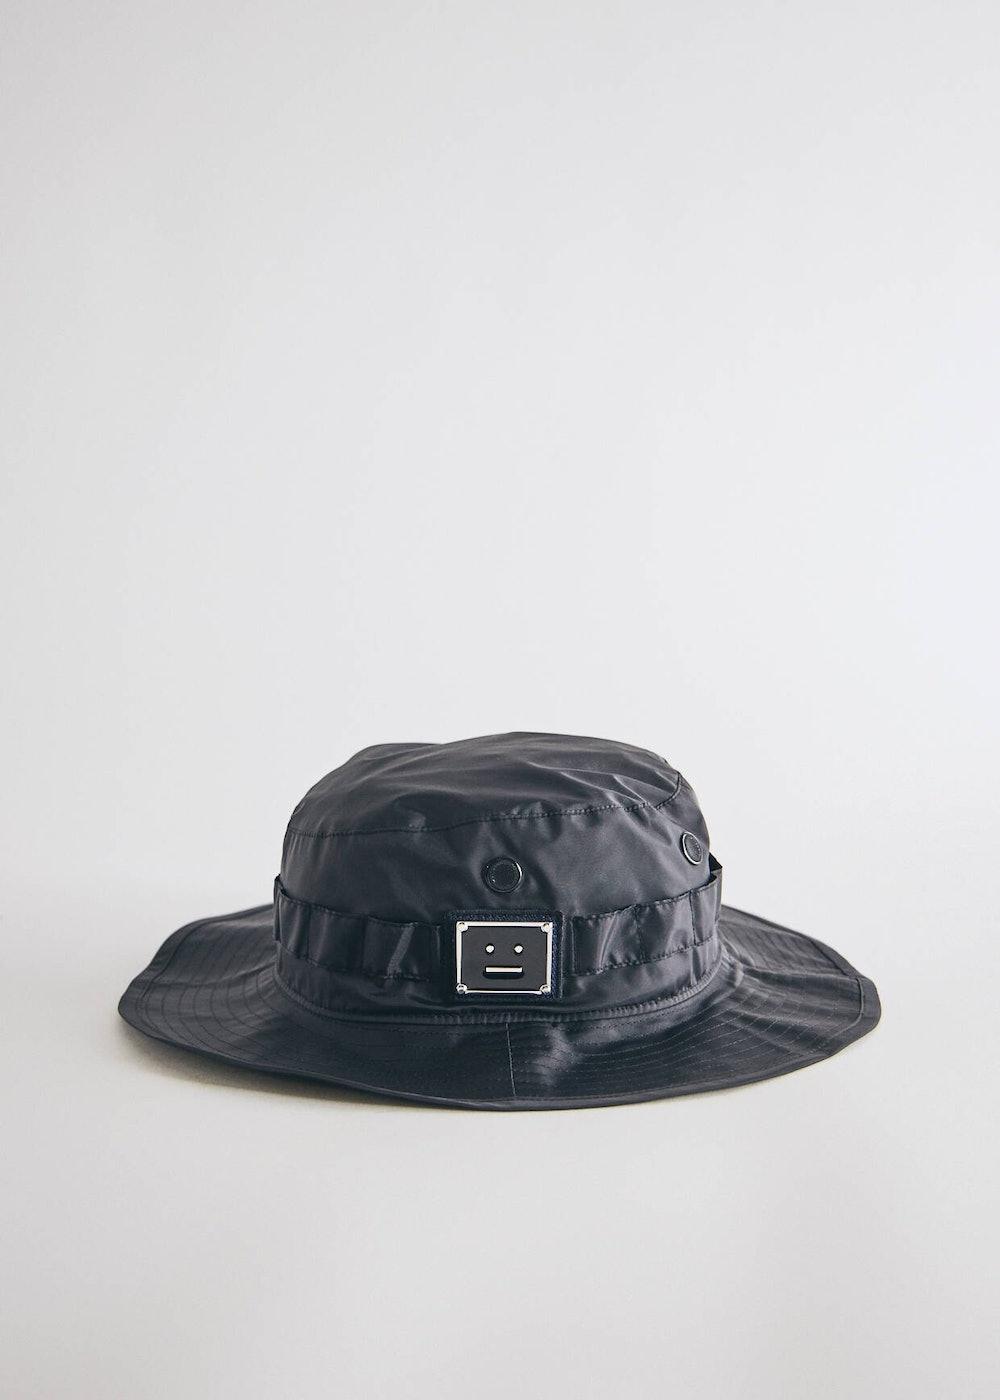 Brimm Plaque Face Hat in Black